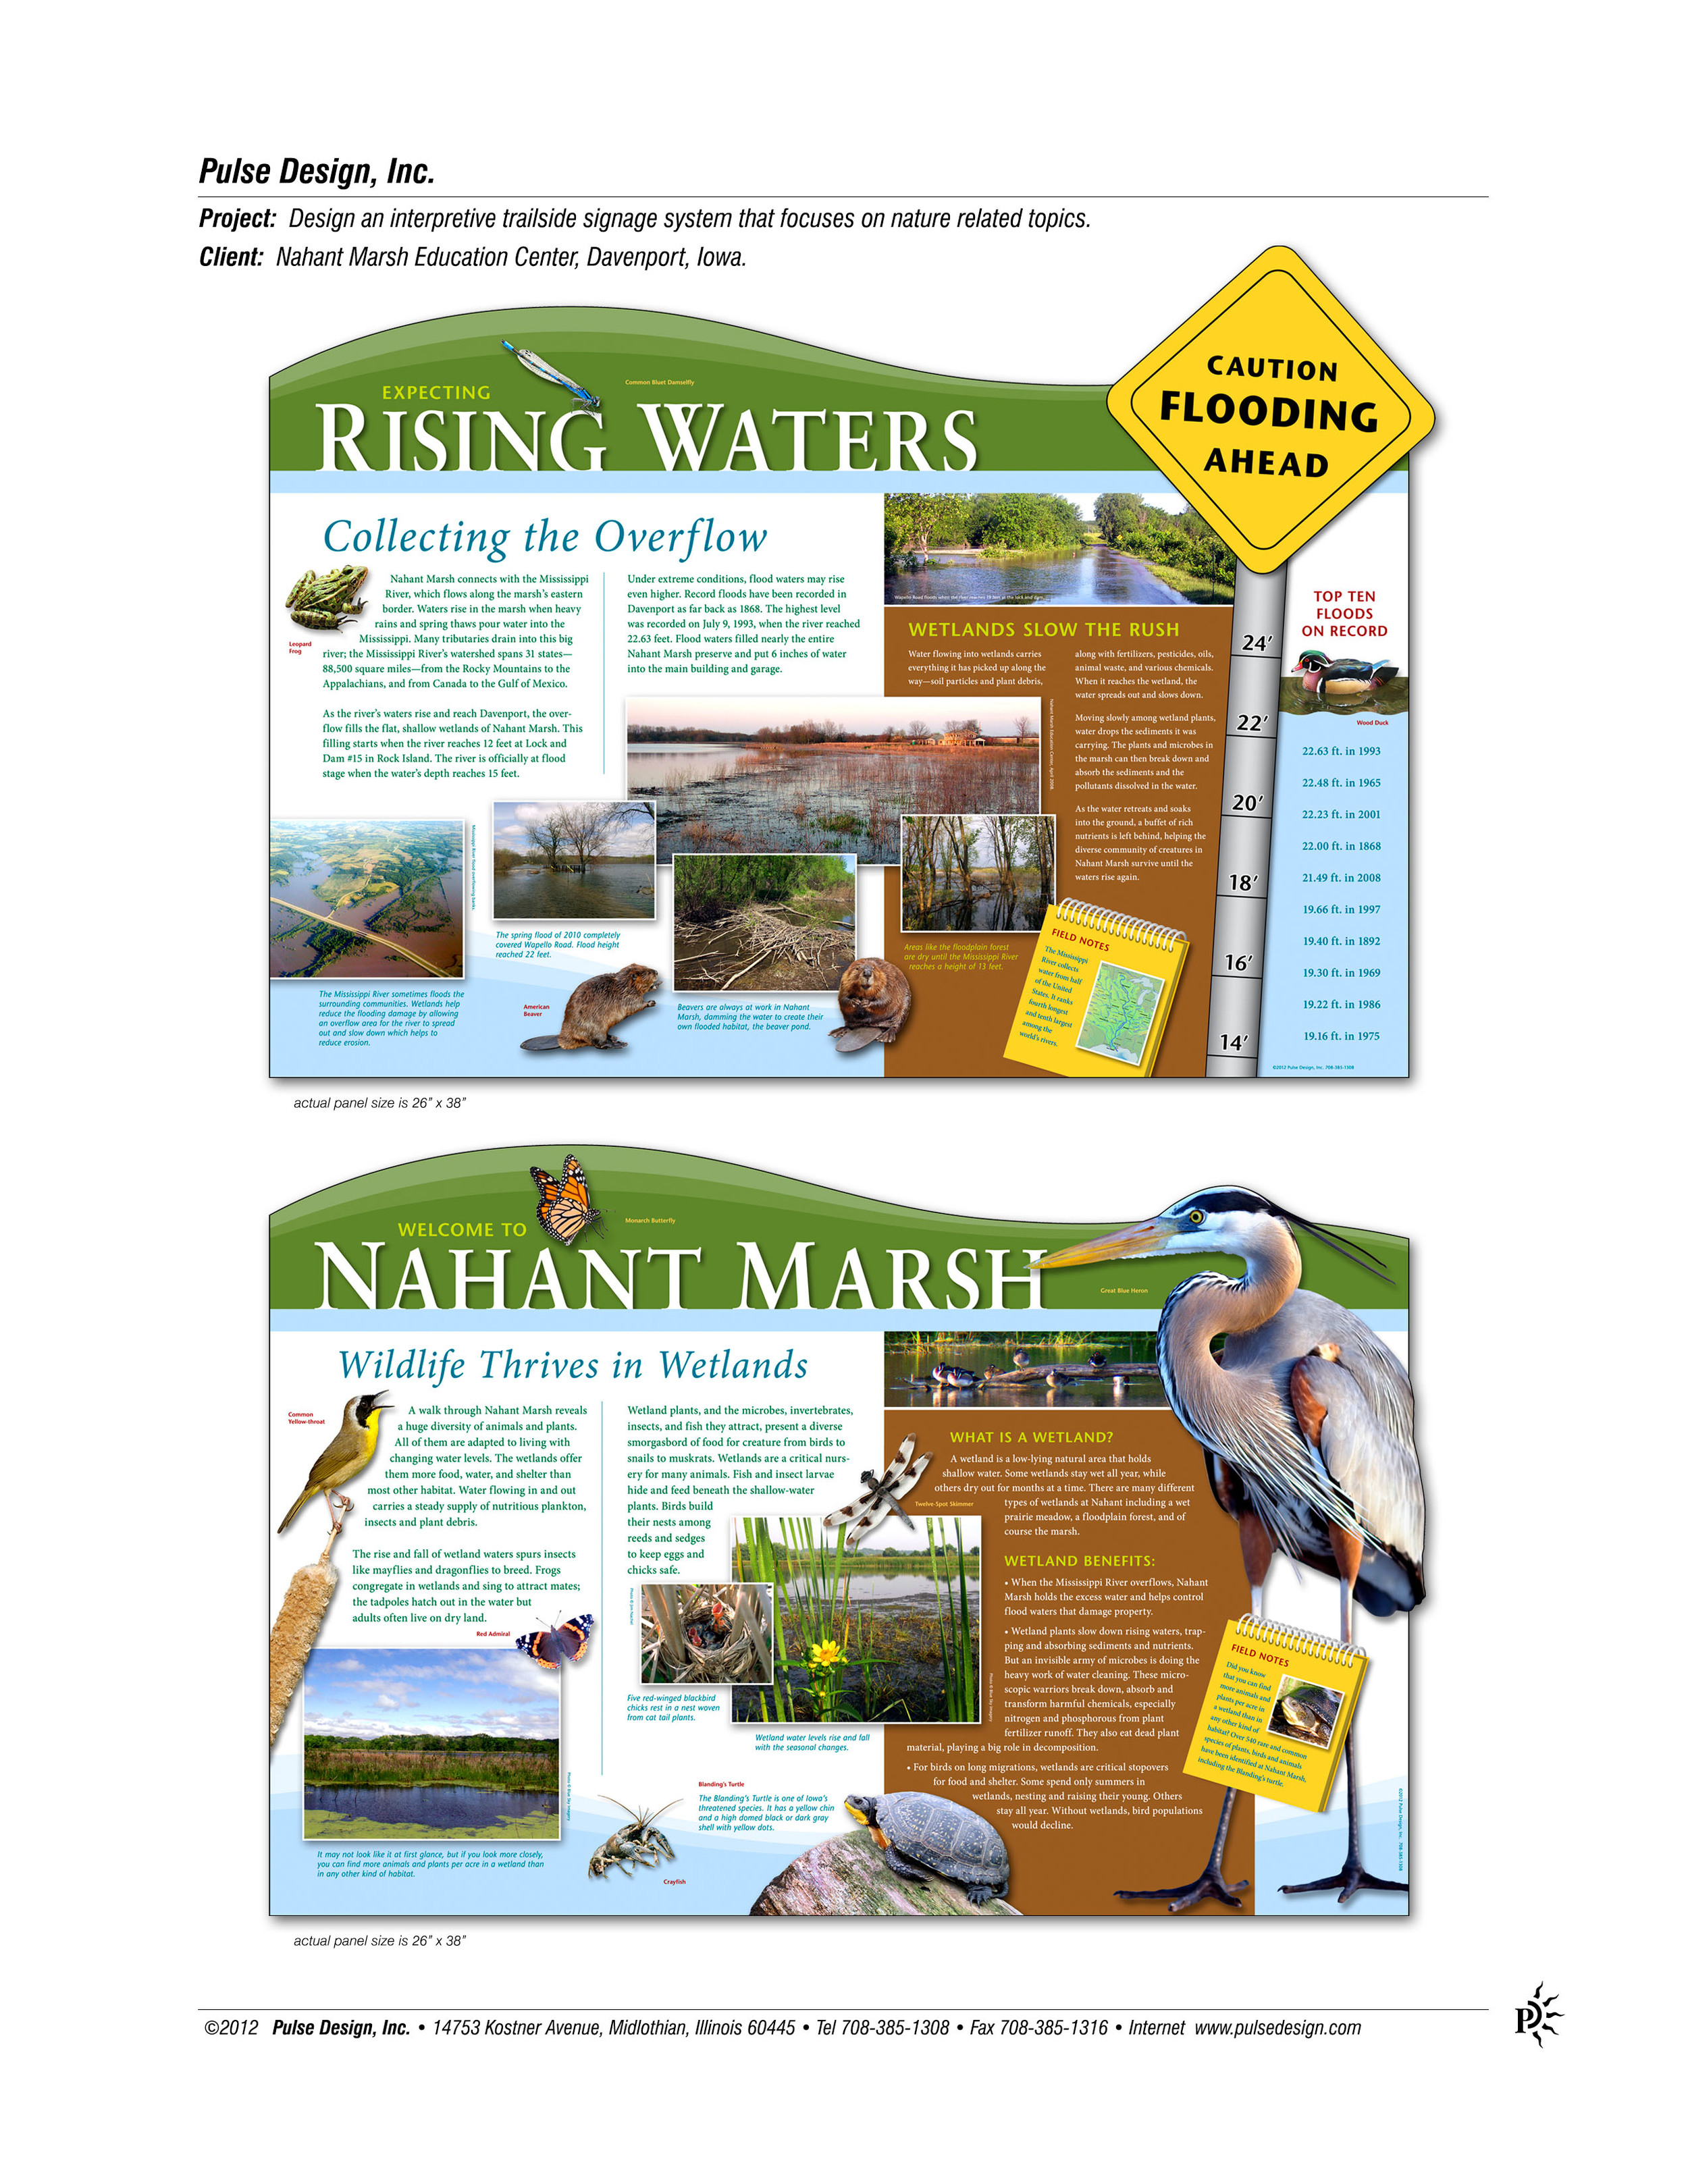 Nahant-Marsh-Trail-Signs-Pulse-Design-Inc.jpg